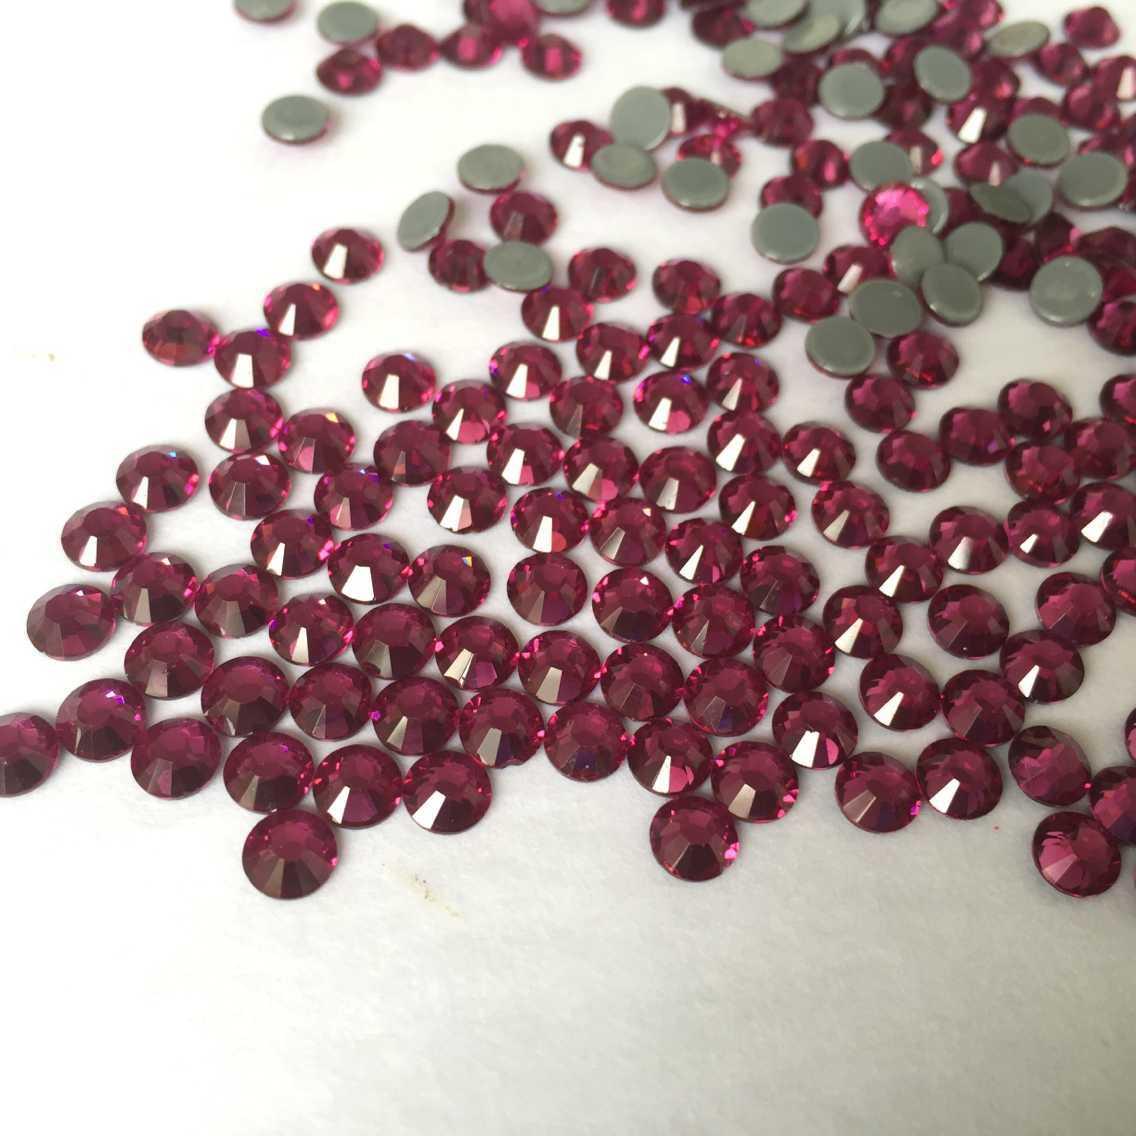 JP rhinestones ss16 ab effect high quality Australia hot fix rhinestones for clothing